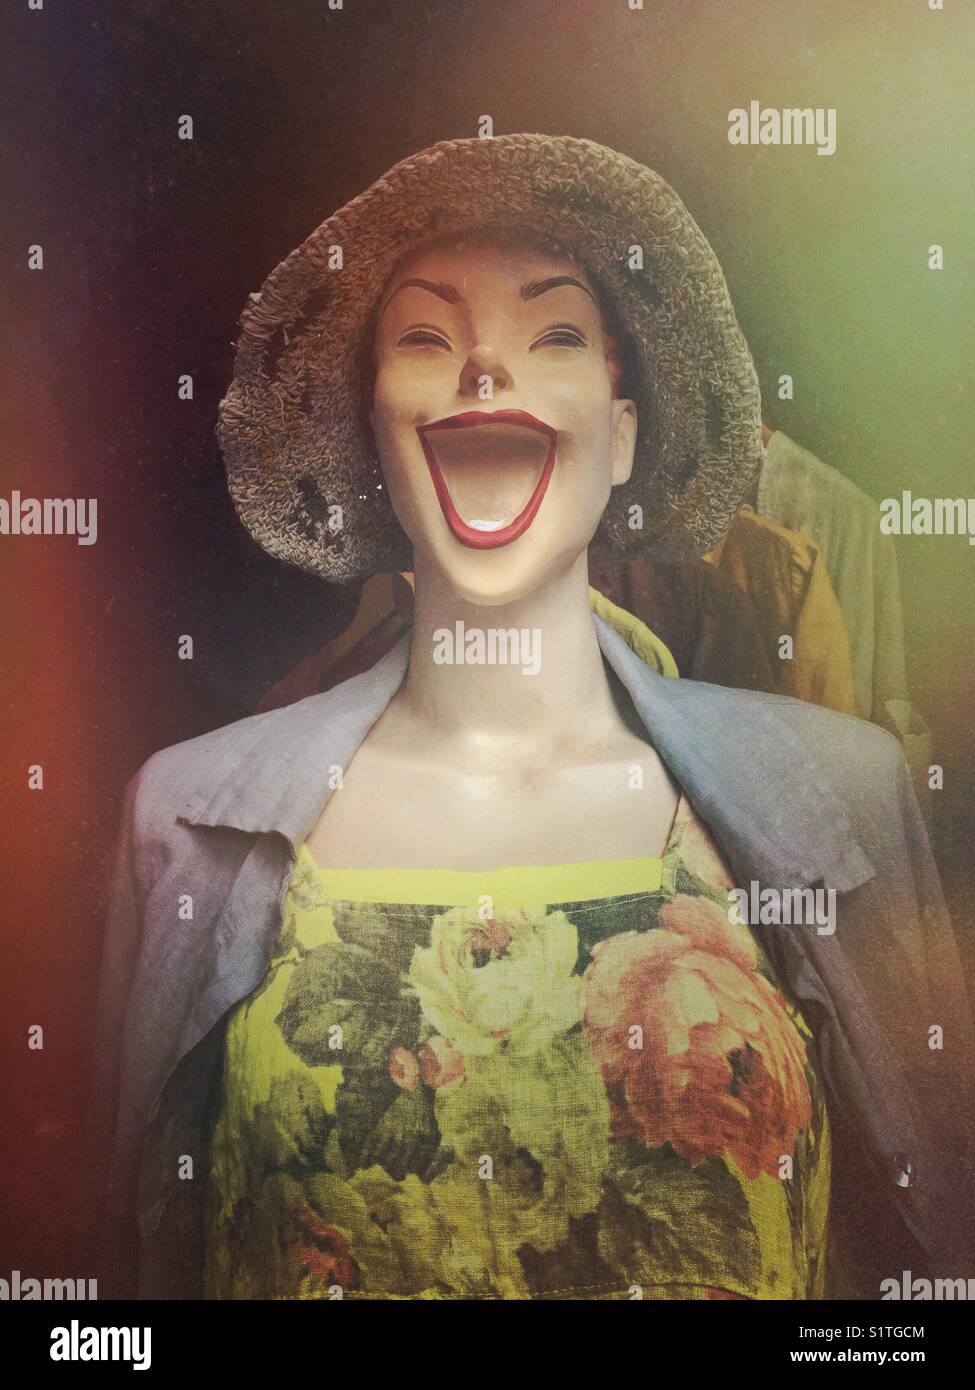 Divertimento ridere mannequin femmina Immagini Stock